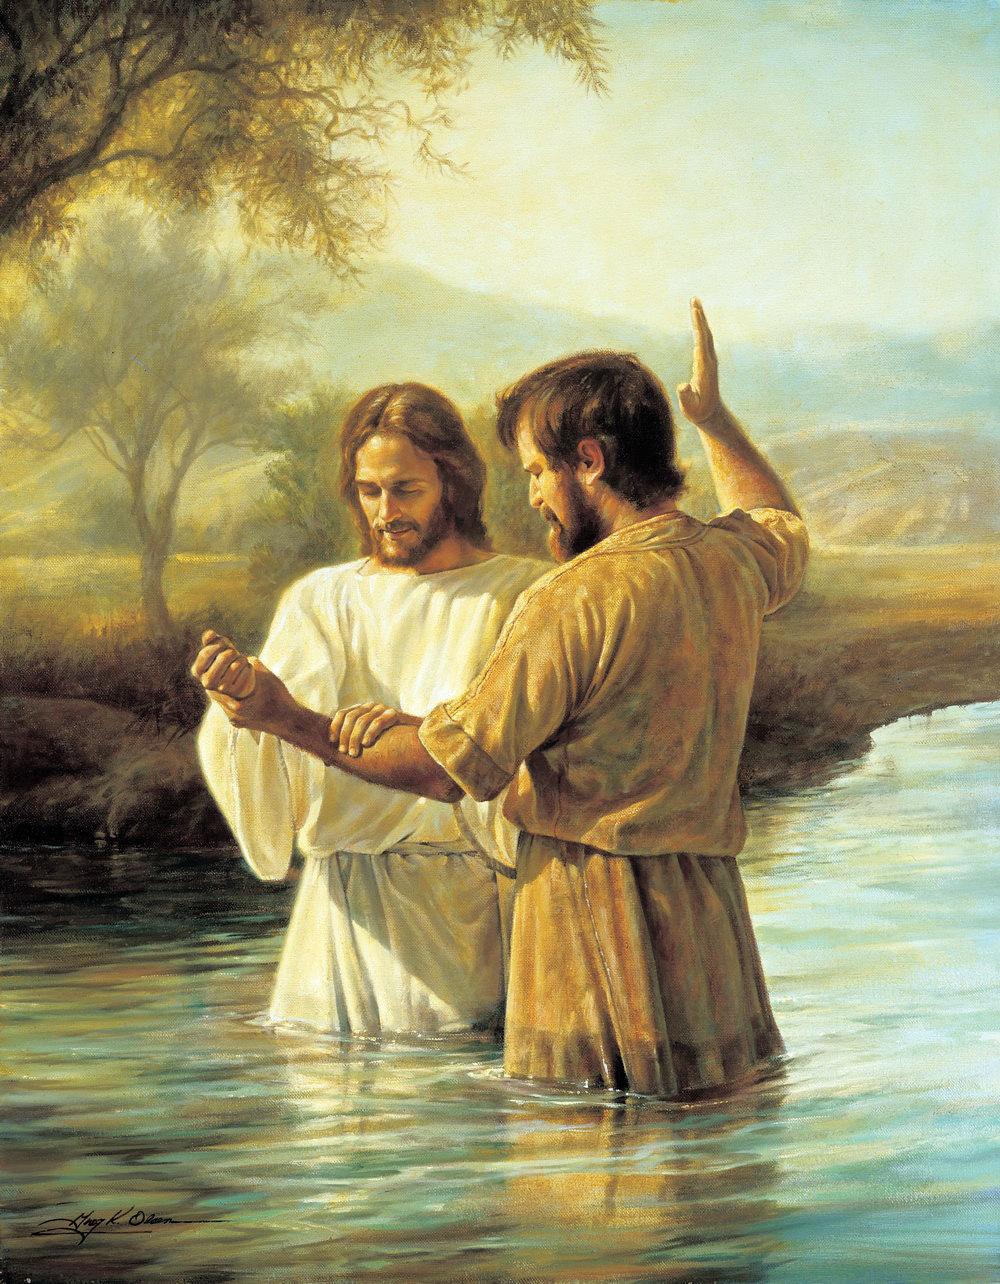 john the babtist babtizes Jesus